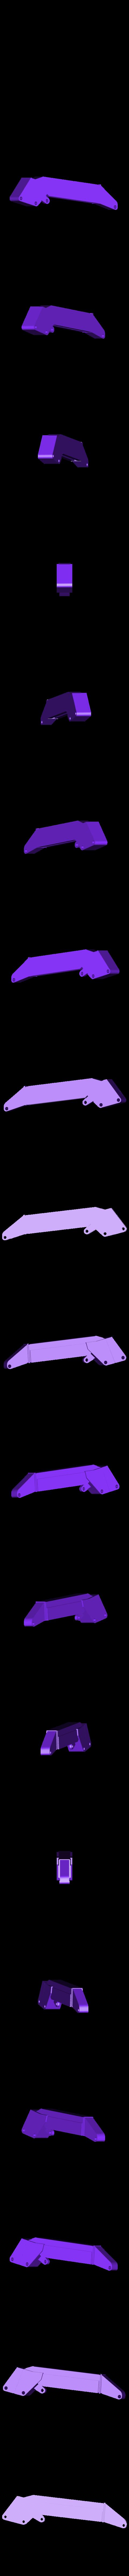 G bras2.STL Download STL file Draisine Matisa for LGB • 3D printable object, biddle